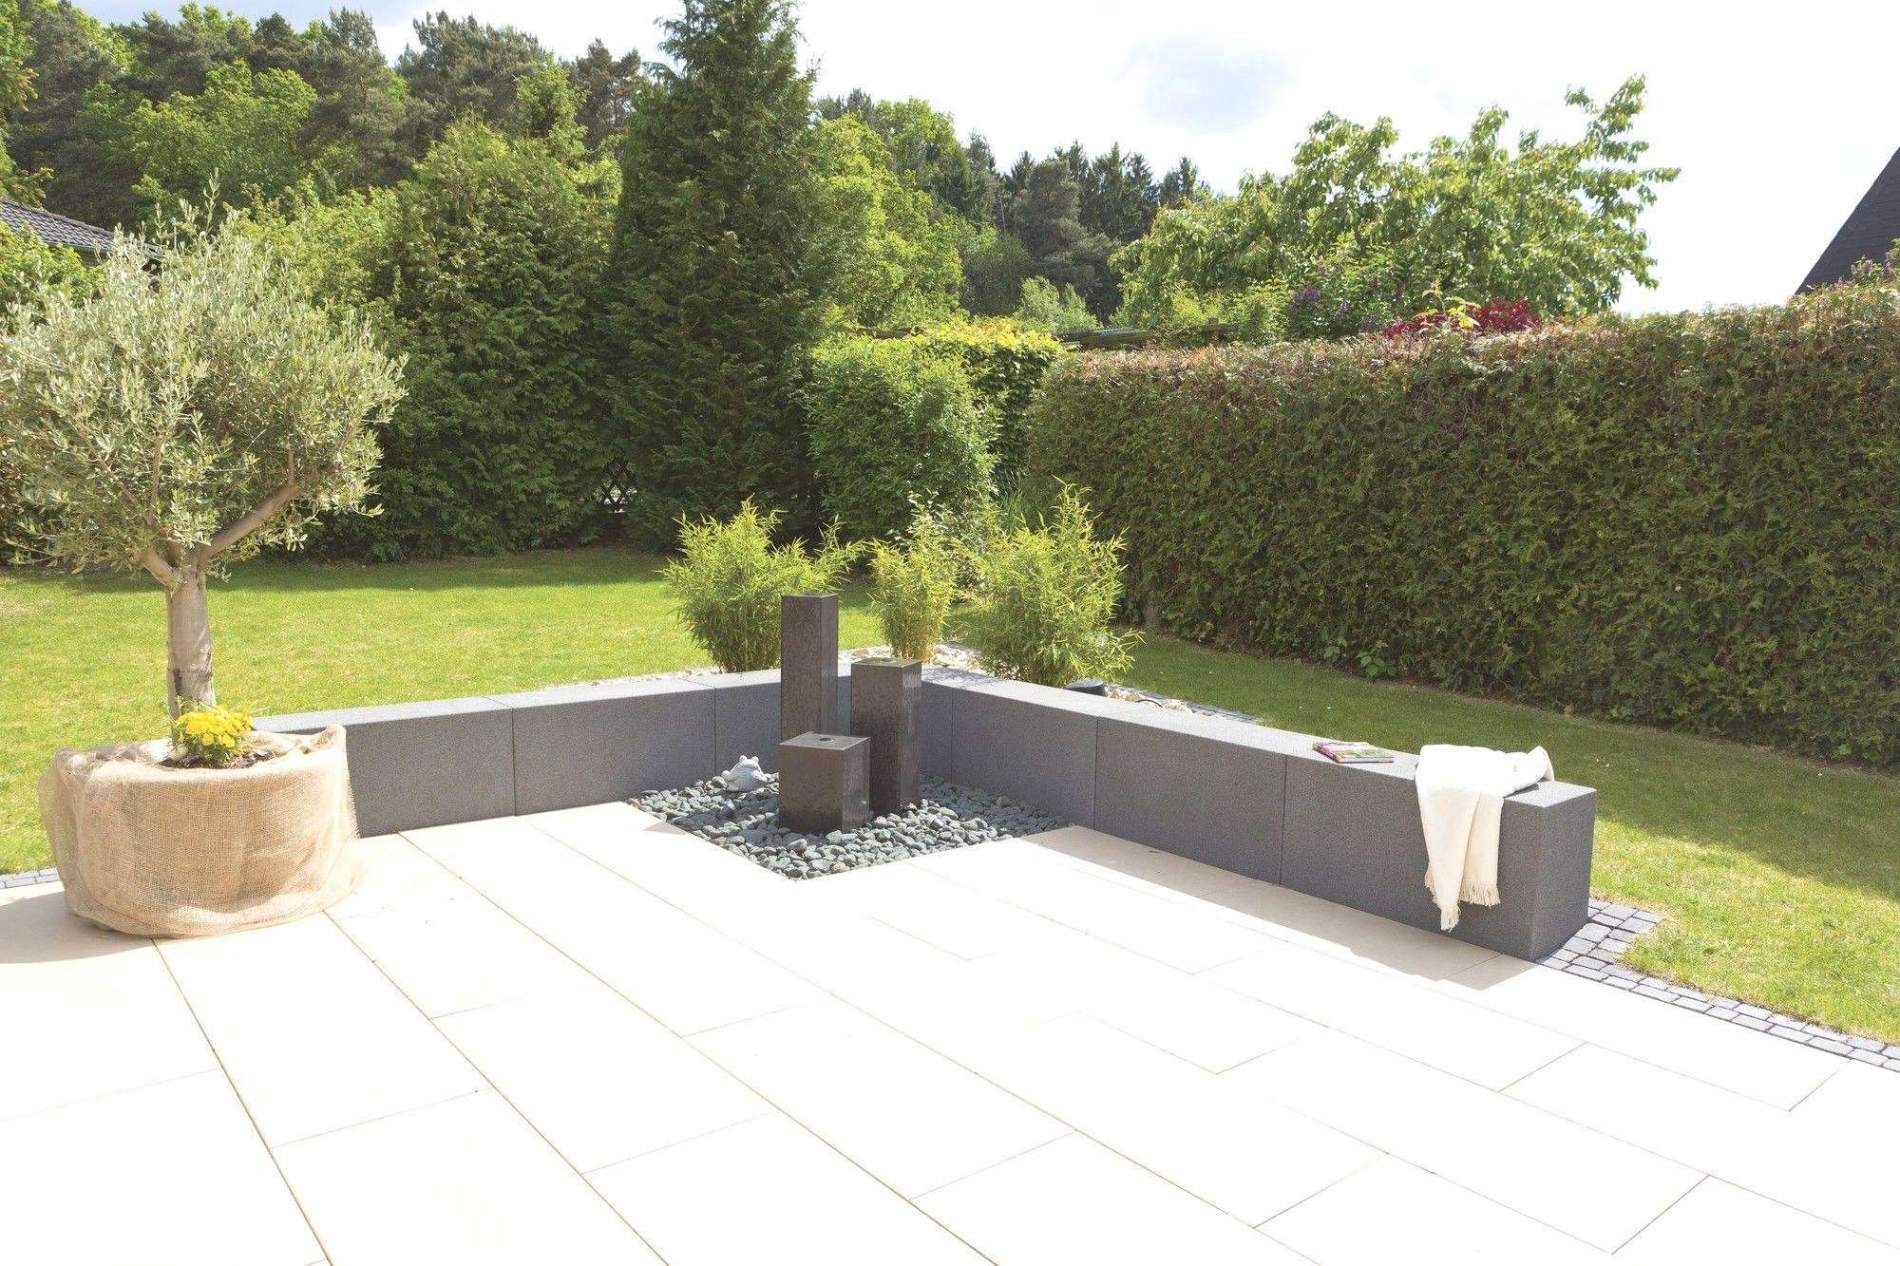 Garten Verkaufen Genial Holzlagerung Im Garten — Temobardz Home Blog